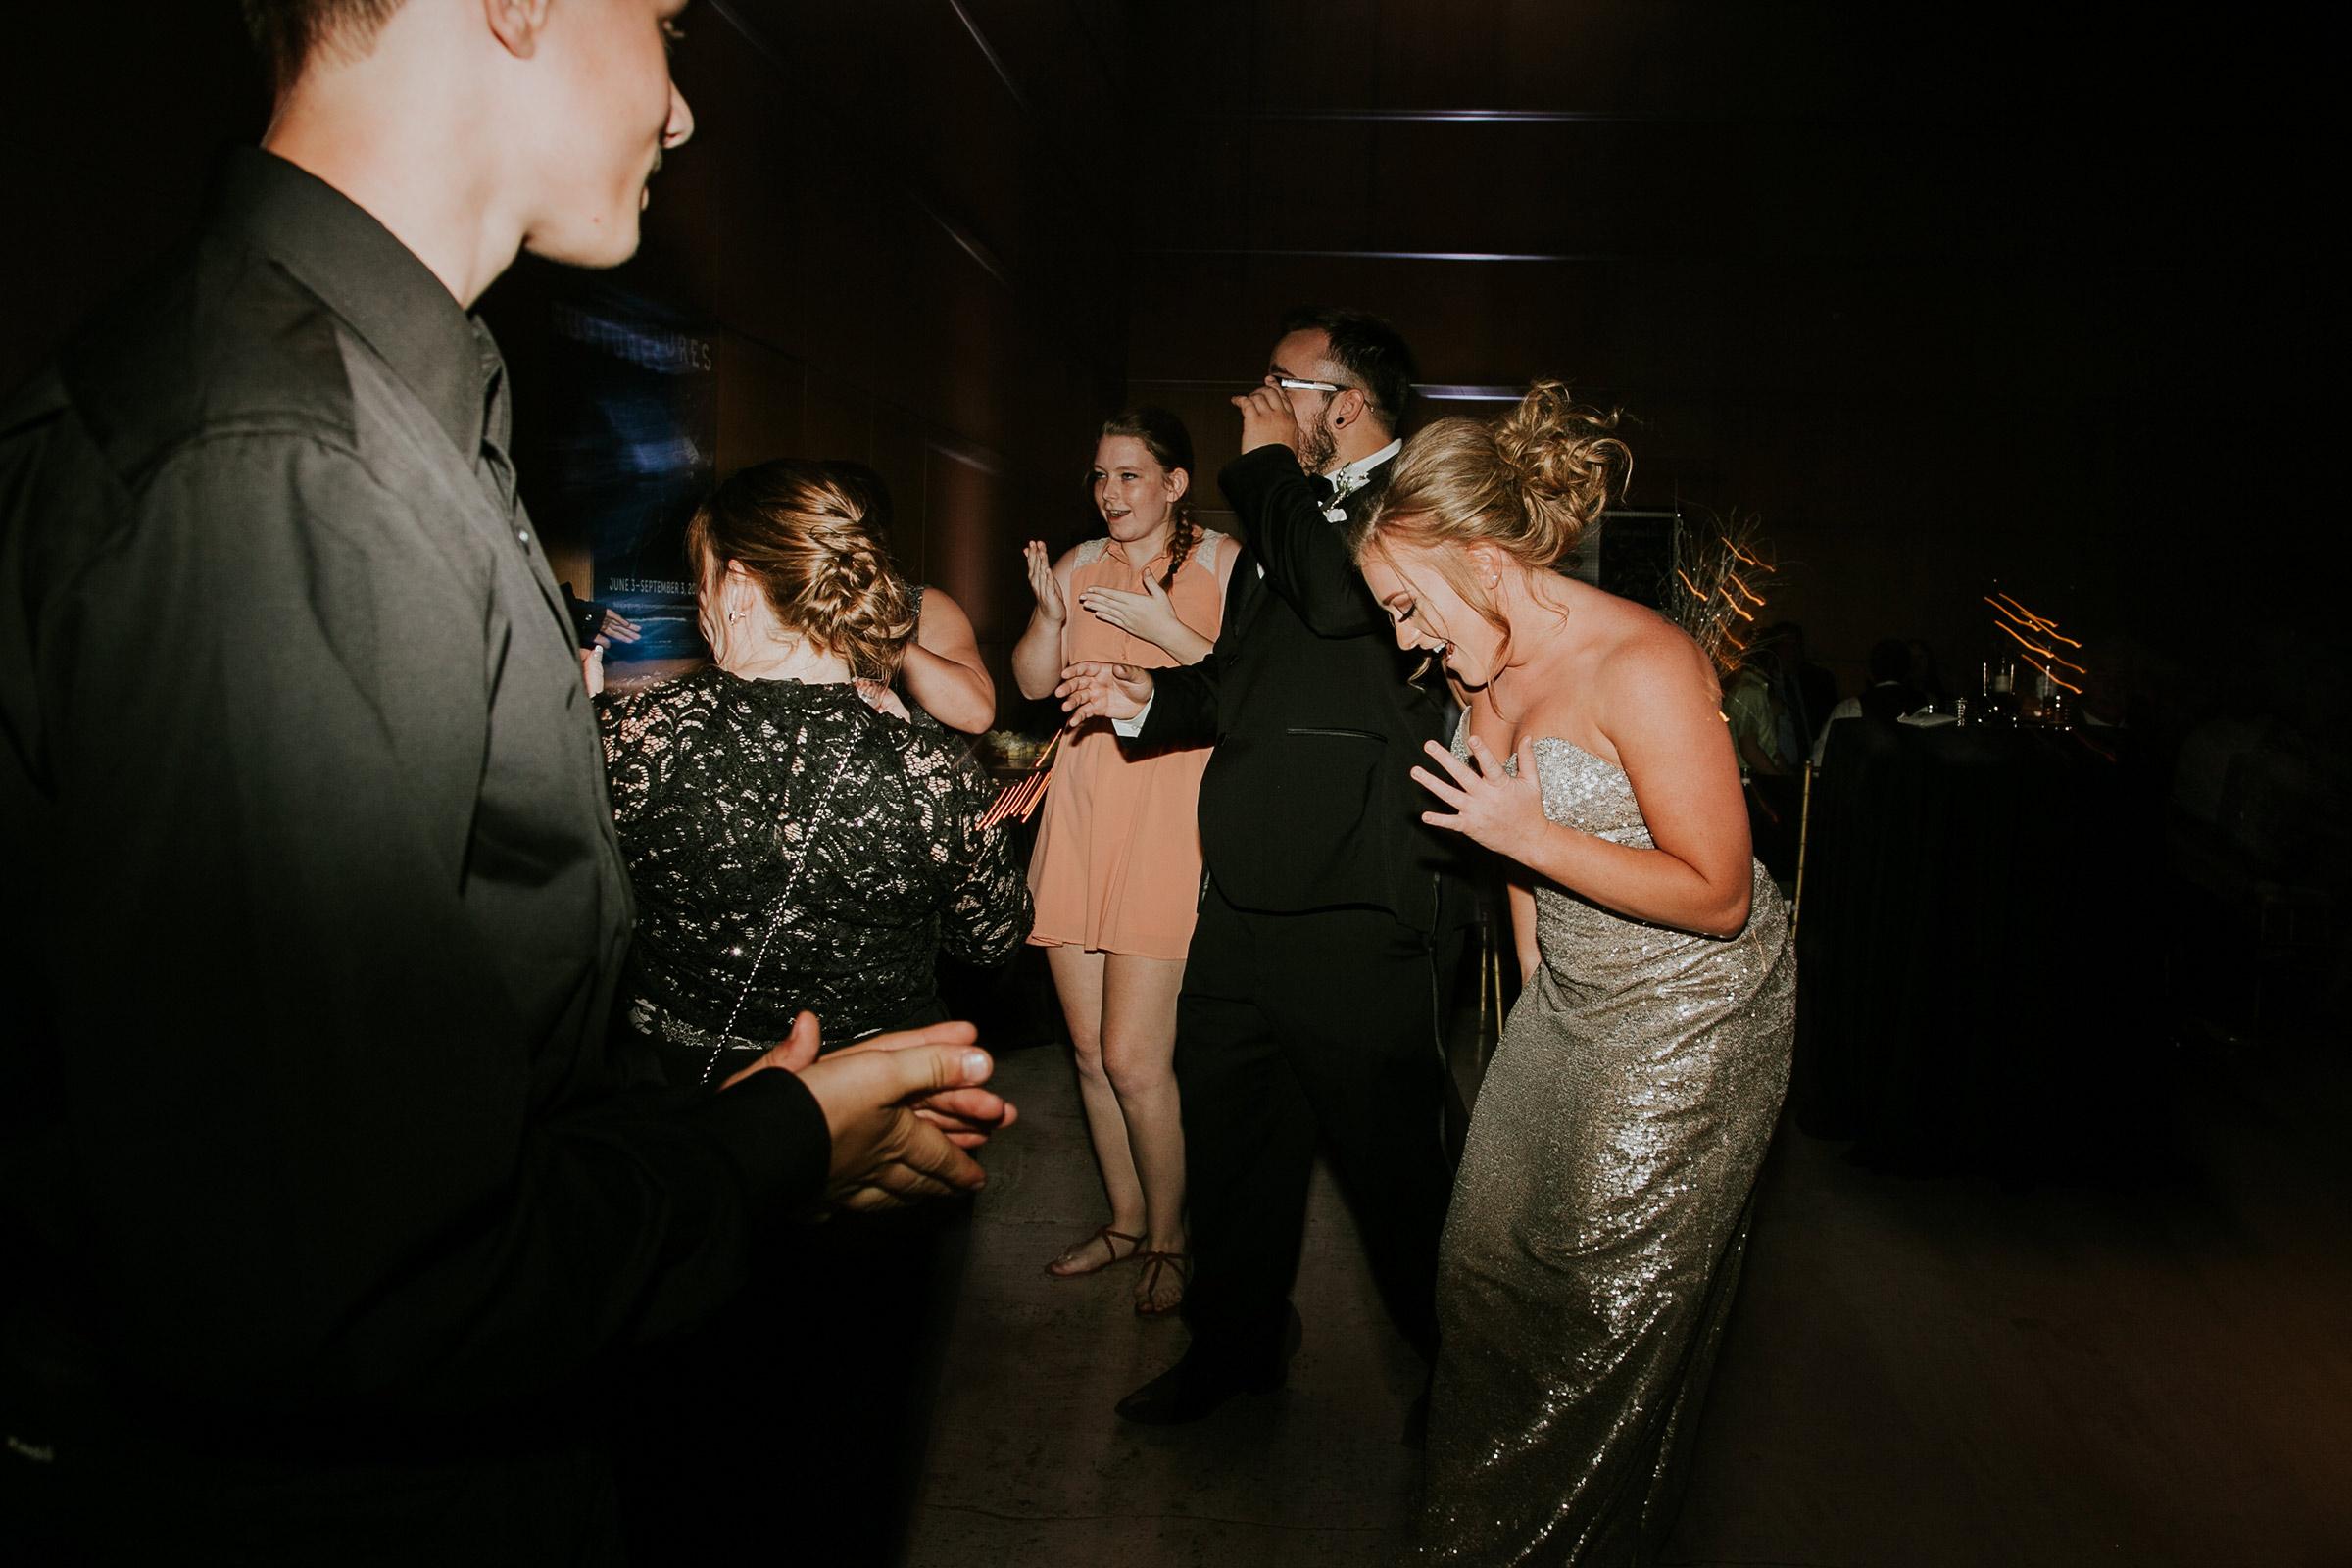 bridesmaid-dancing-with-guest-on-dance-floor-desmoines-iowa-art-center-raelyn-ramey-photography.jpg